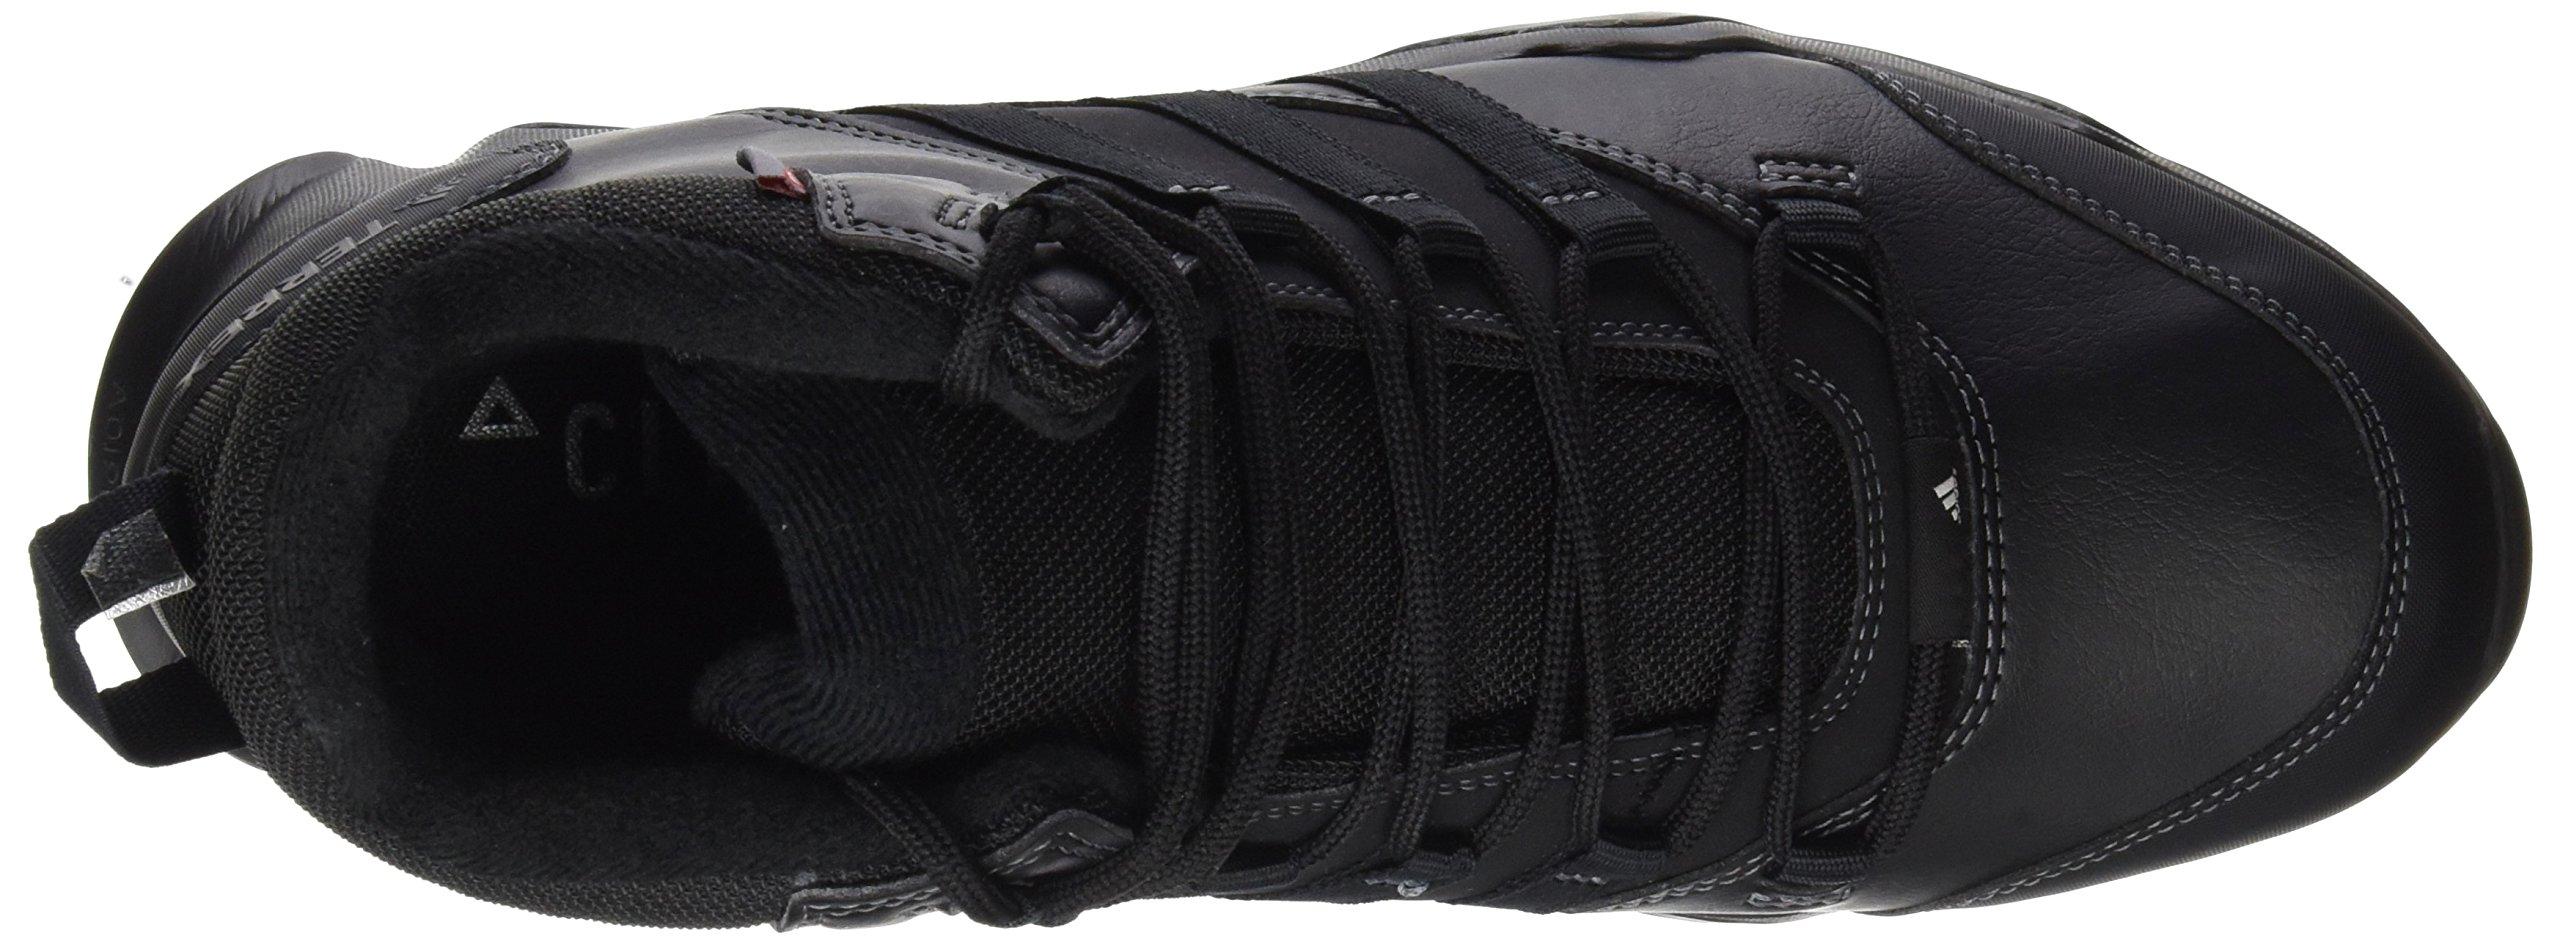 81Tp4nDXQkL - adidas Men's Terrex Ax2r Beta Mid Cw High Rise Hiking Boots